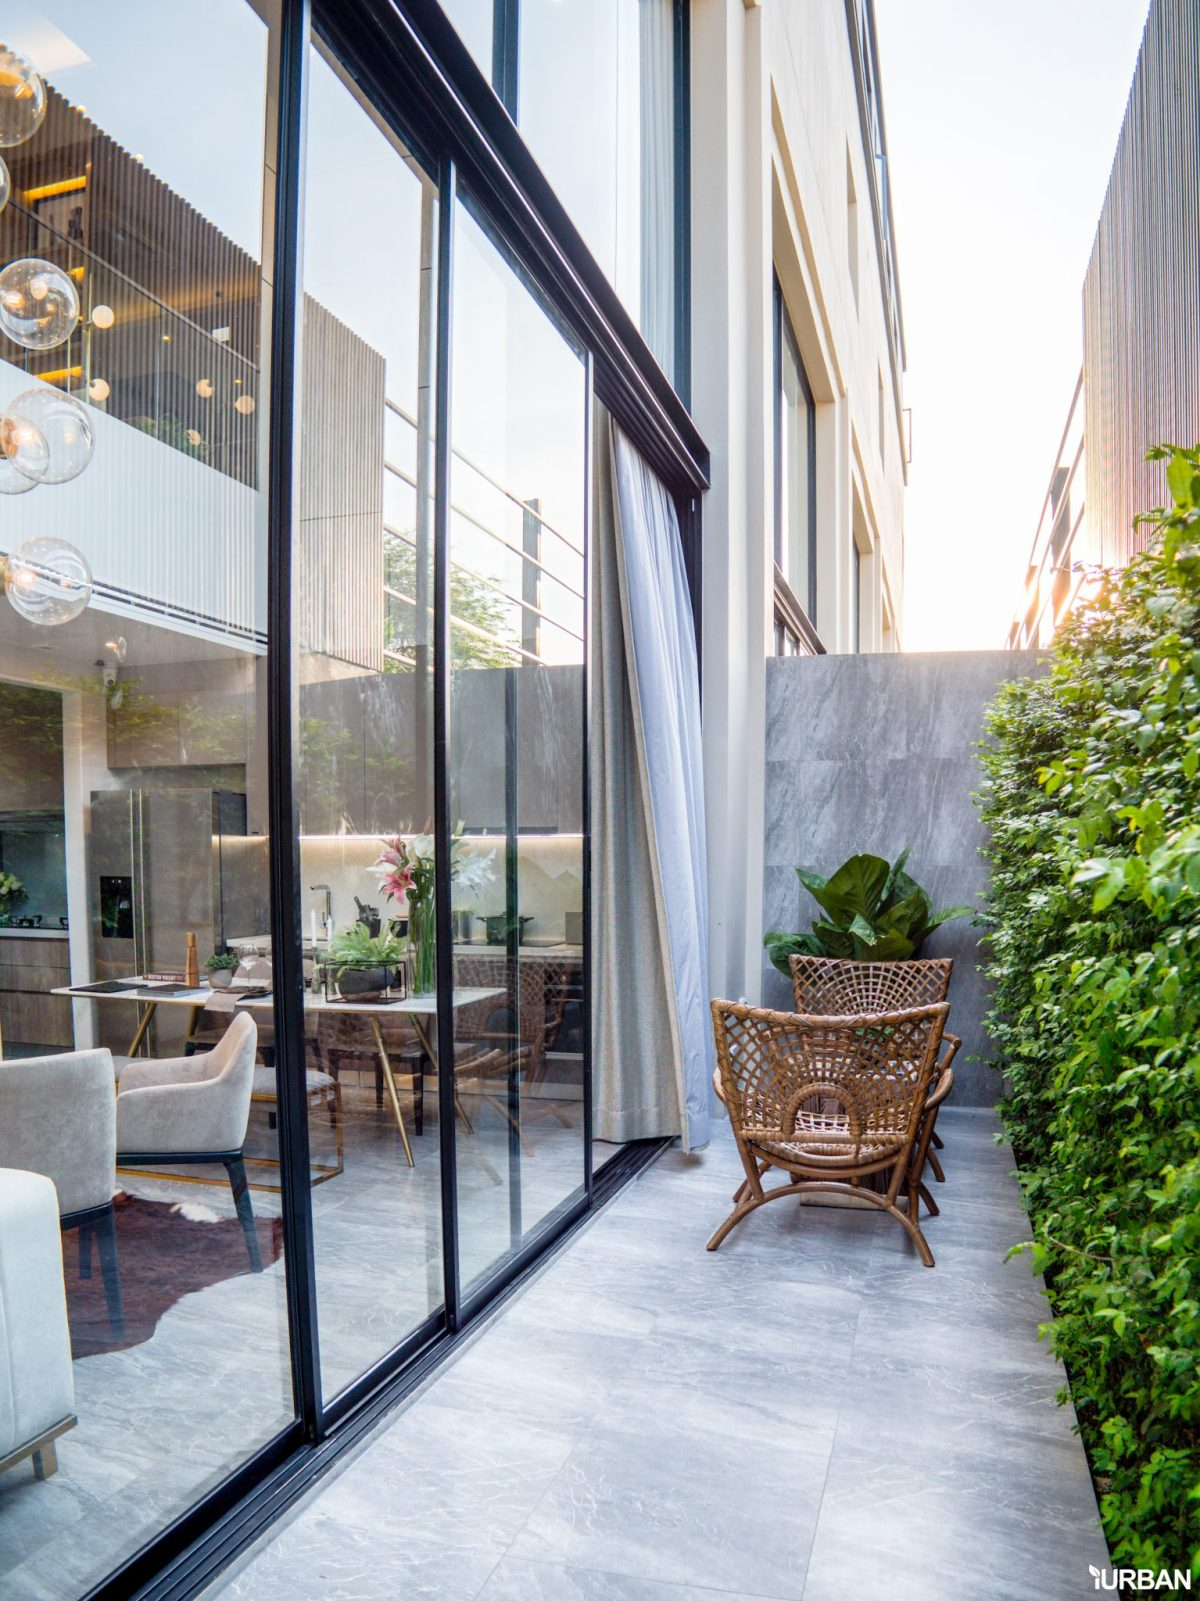 AIRES RAMA9 รีวิว Luxury Townhome 3.5 ชั้น + Rooftop ออกแบบสวย ย่านพระราม9 (ใกล้ รพ.สมิติเวช) 34 - AIRES